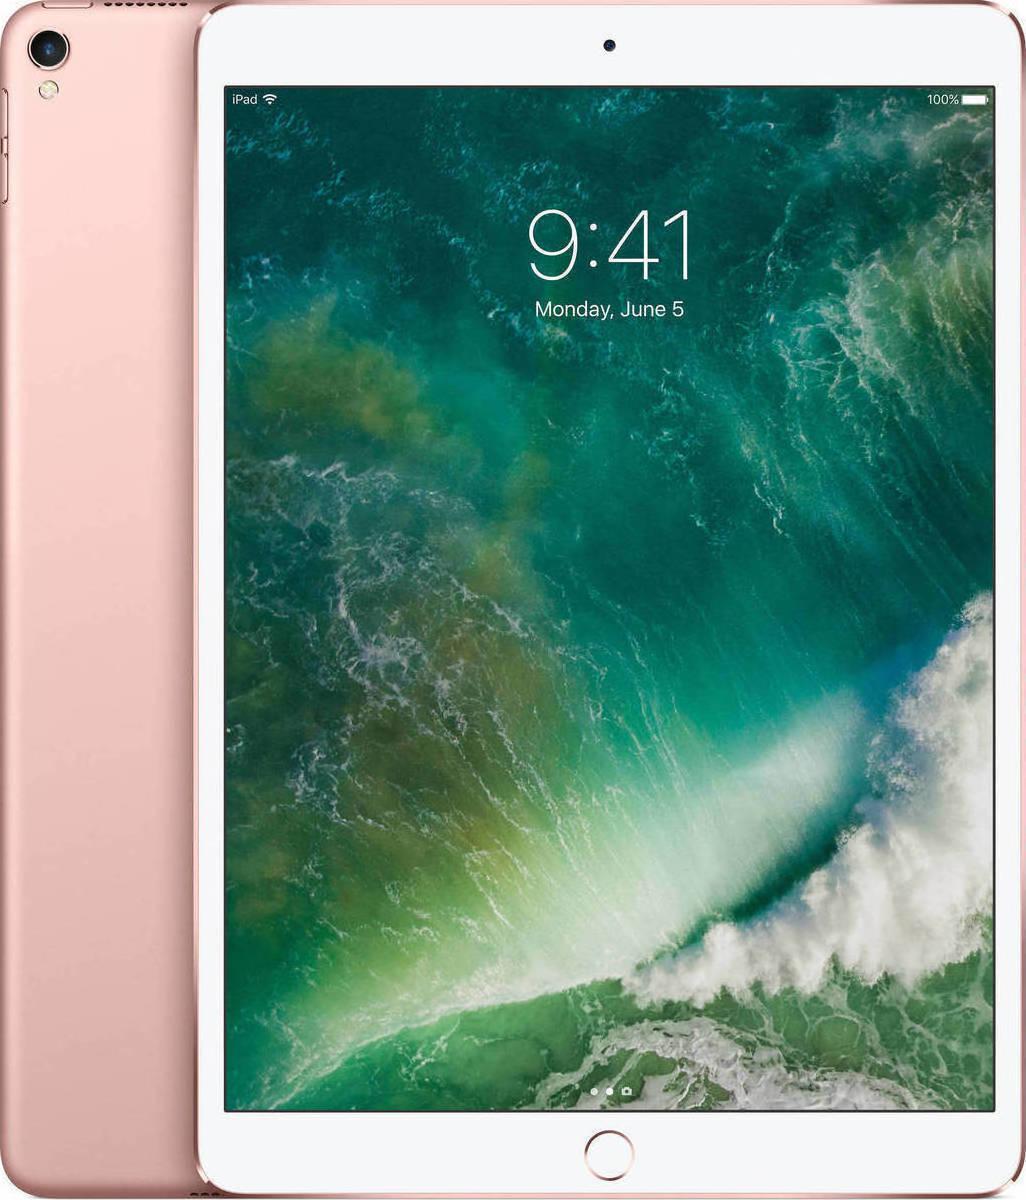 Apple iPad Pro 12.9'' 2017 WiFi and Cellular 512GB Rose Gold Με Αντάπτορα Πληρωμή έως 12 δόσεις